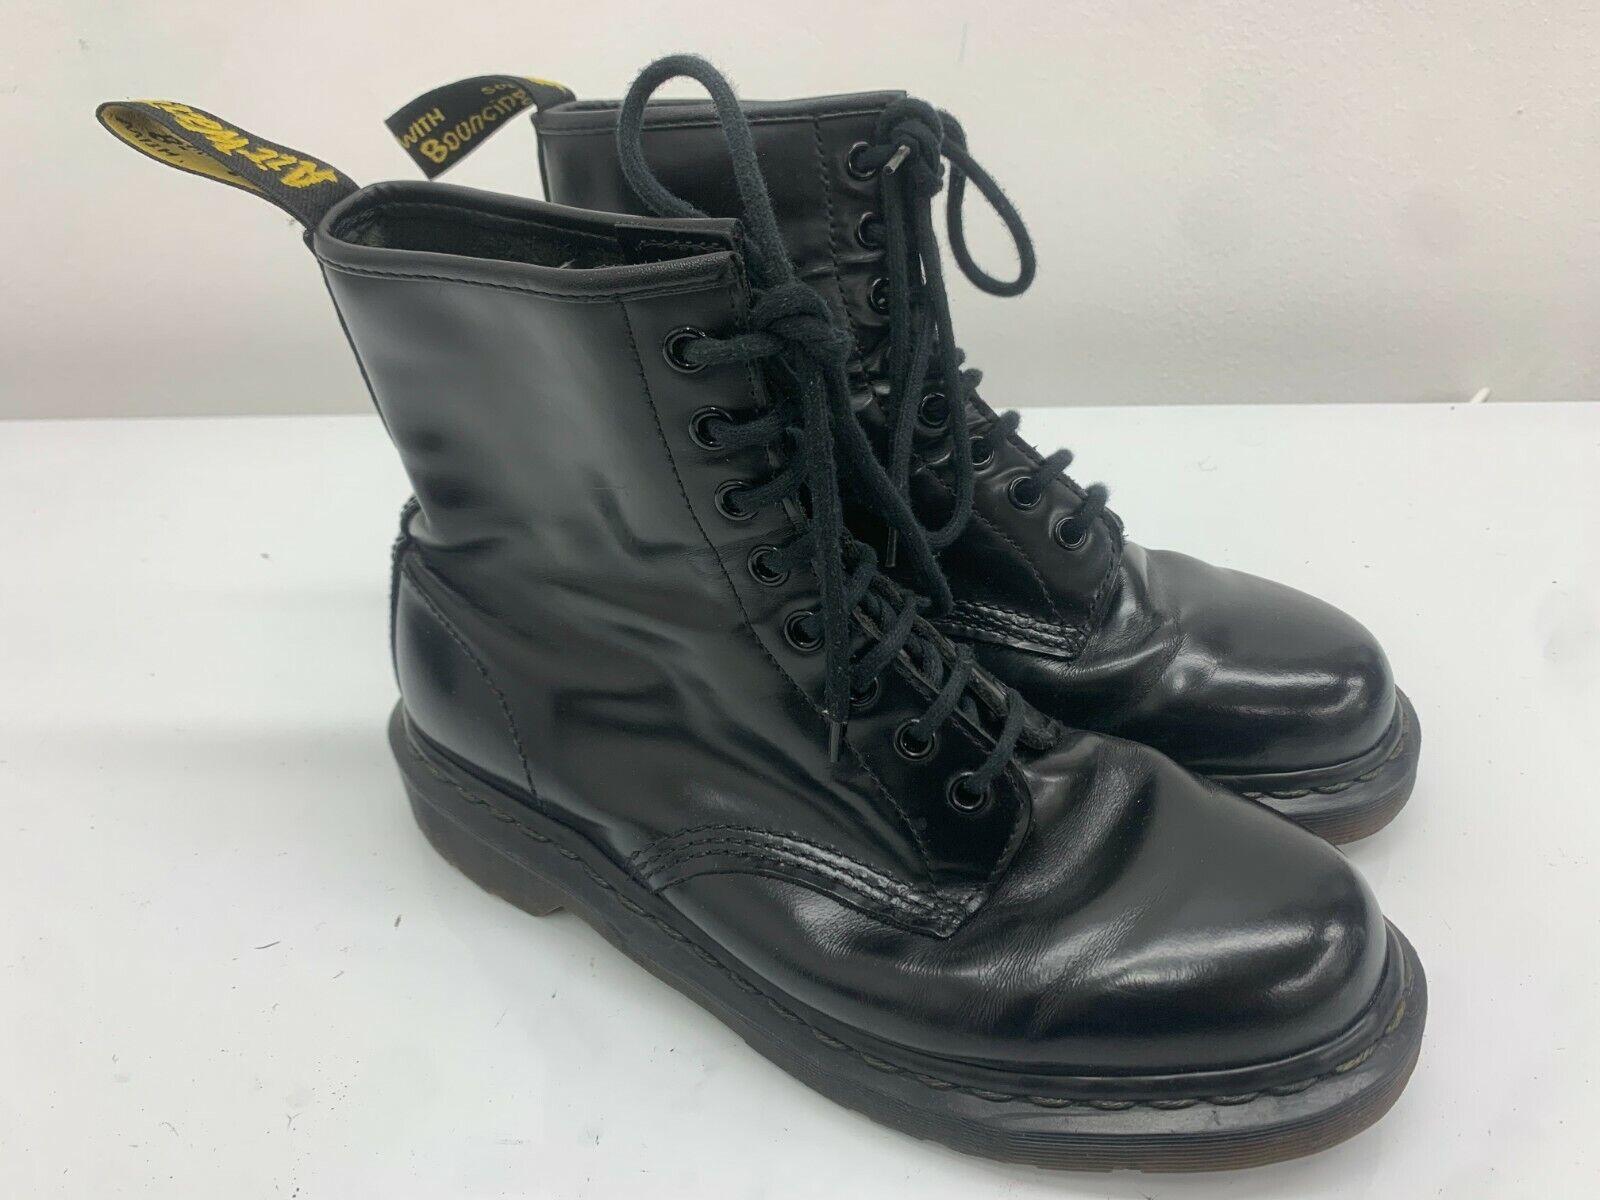 Dr Doc Martens Boots, Size 8UK, Black Shiny, 8 Eyelet, Docs Rare